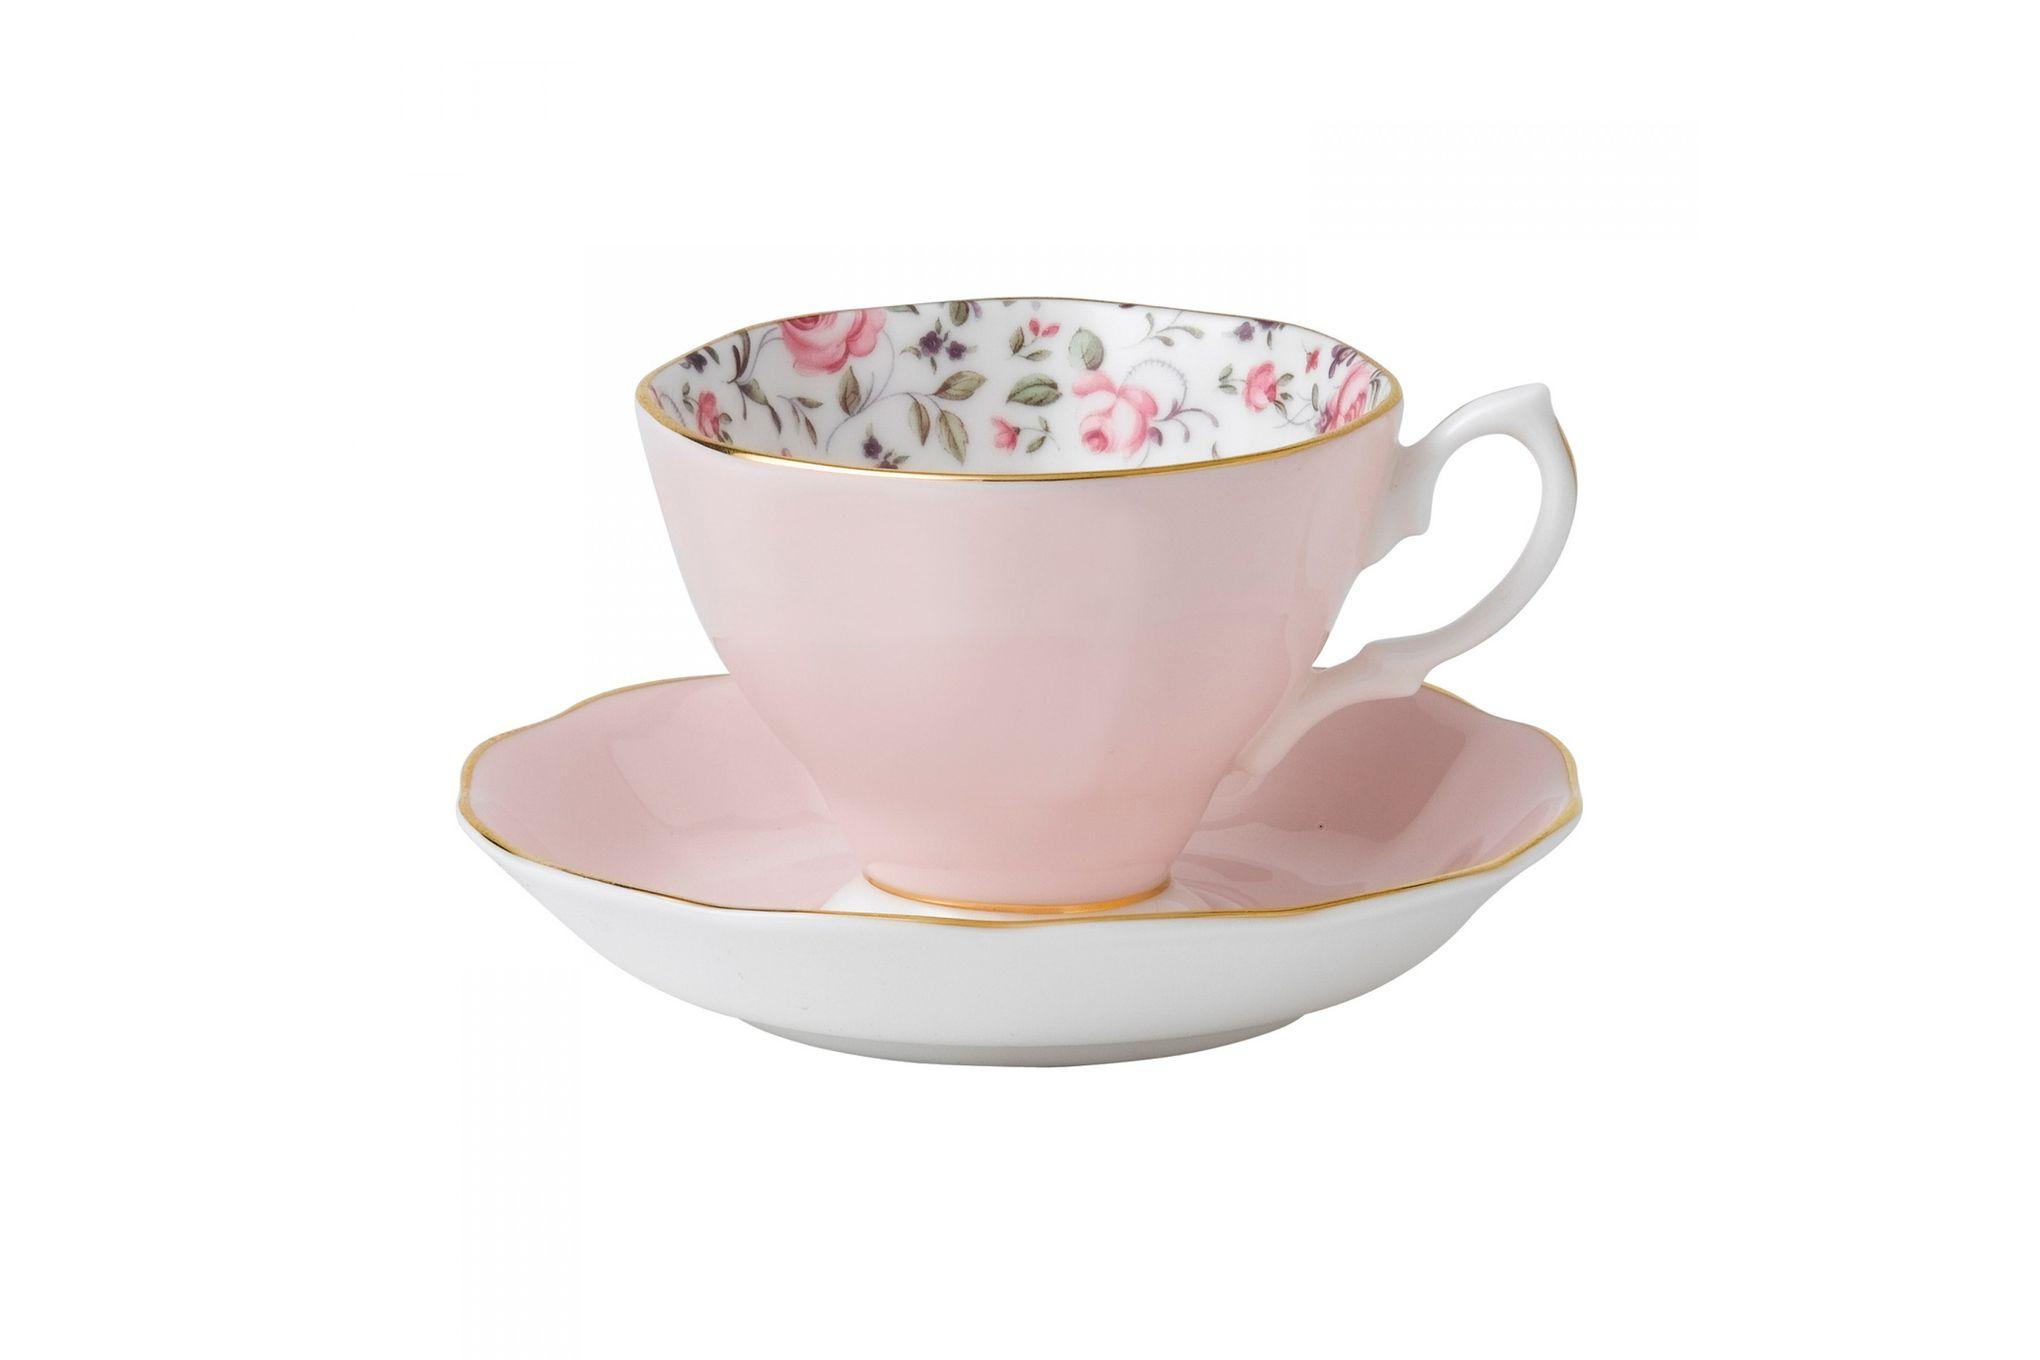 Royal Albert Rose Confetti Teacup & Saucer Vintage thumb 1